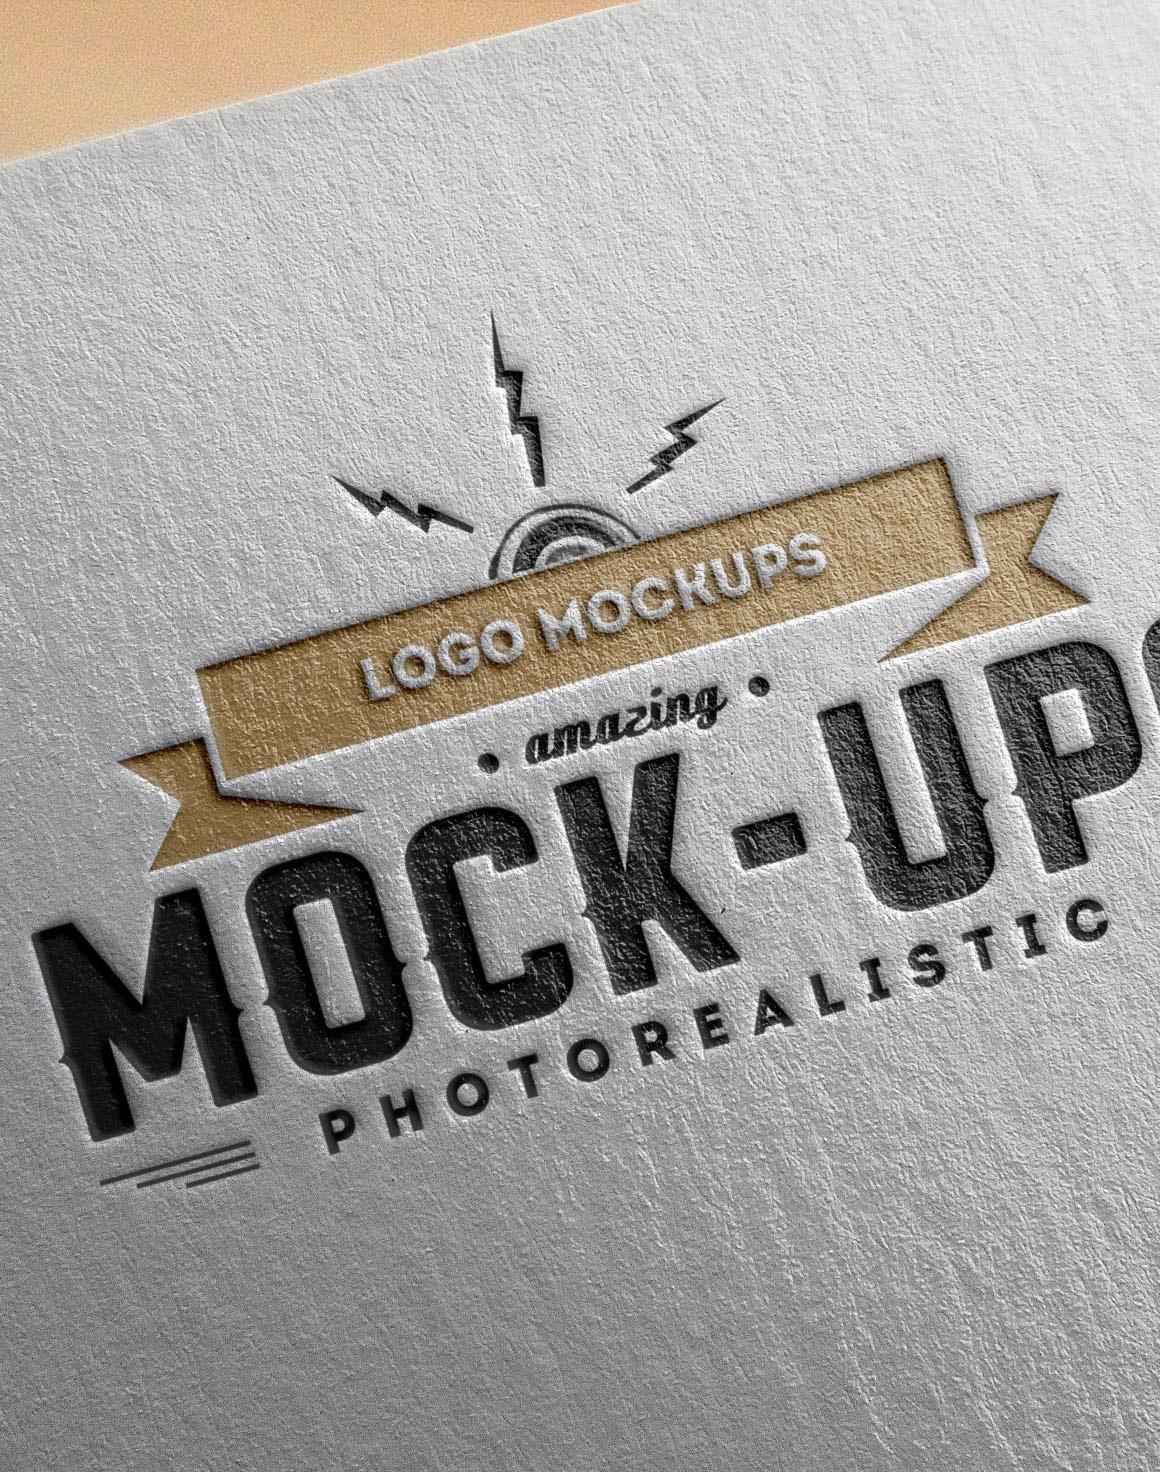 free freebie dealjumbo Free Template free download free mockup  mock-up presentation logo Mockup free logo mock-up Logo presentation photoshop